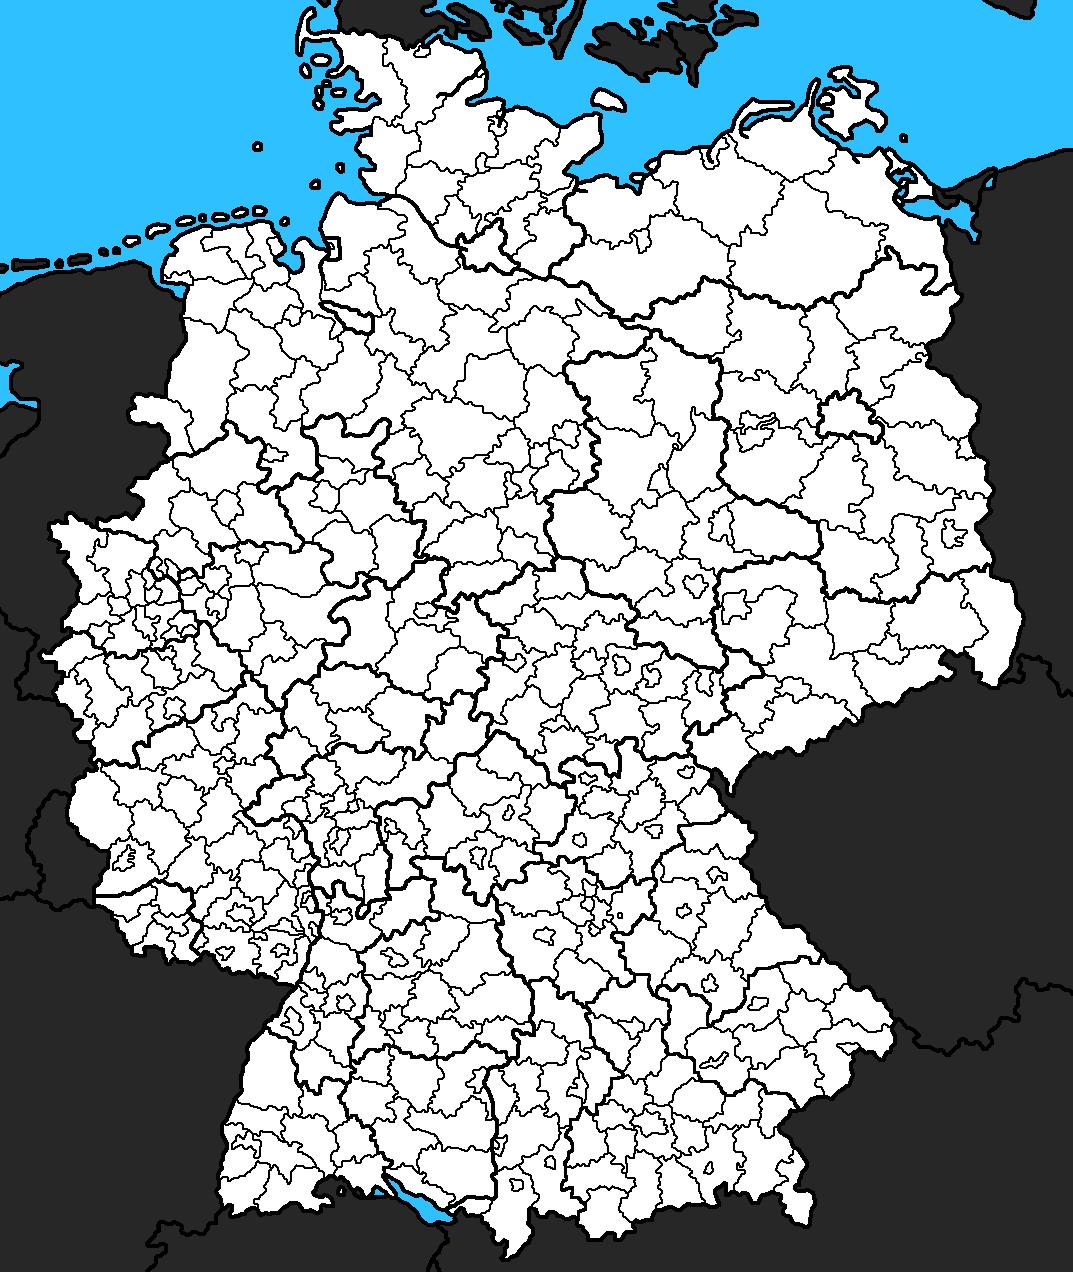 DeutschlandBRKarteW.png